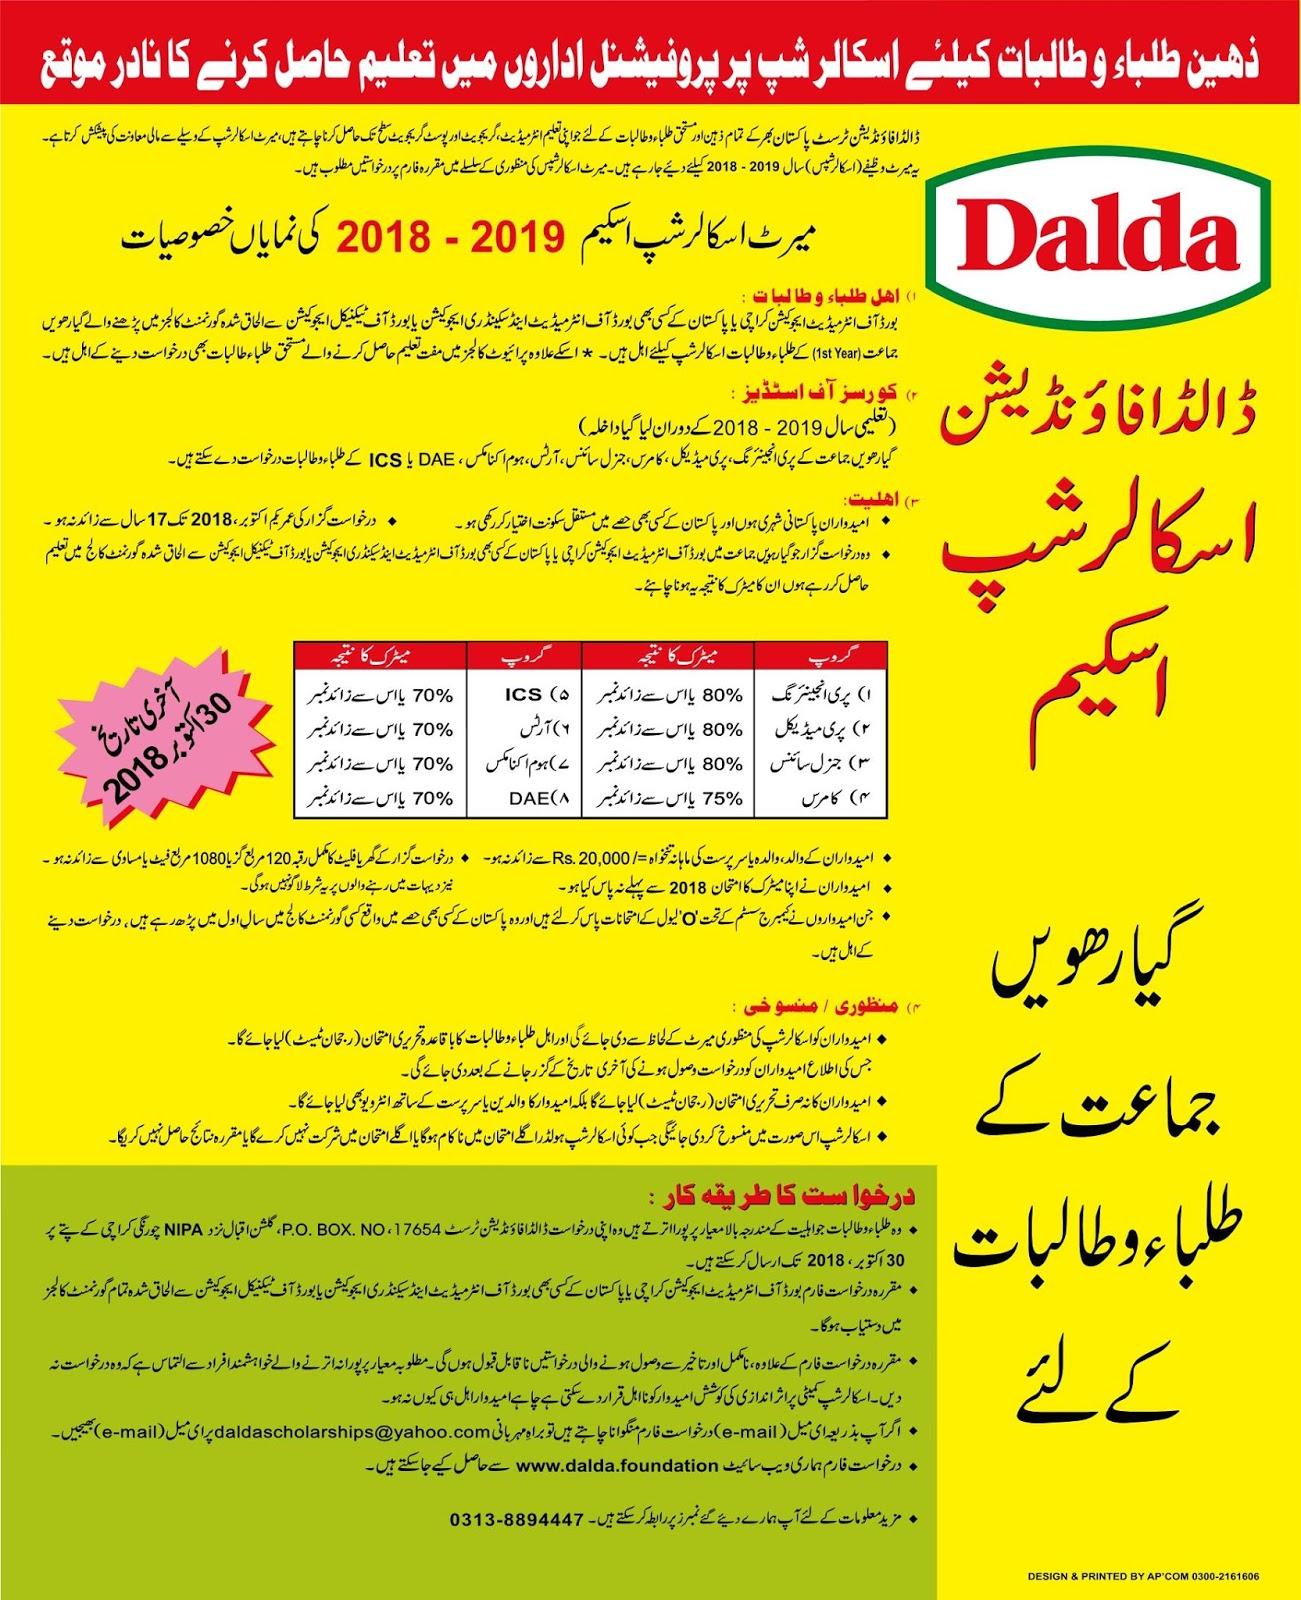 Dalda Scholarship Application Form For Student Of Intermediate Last